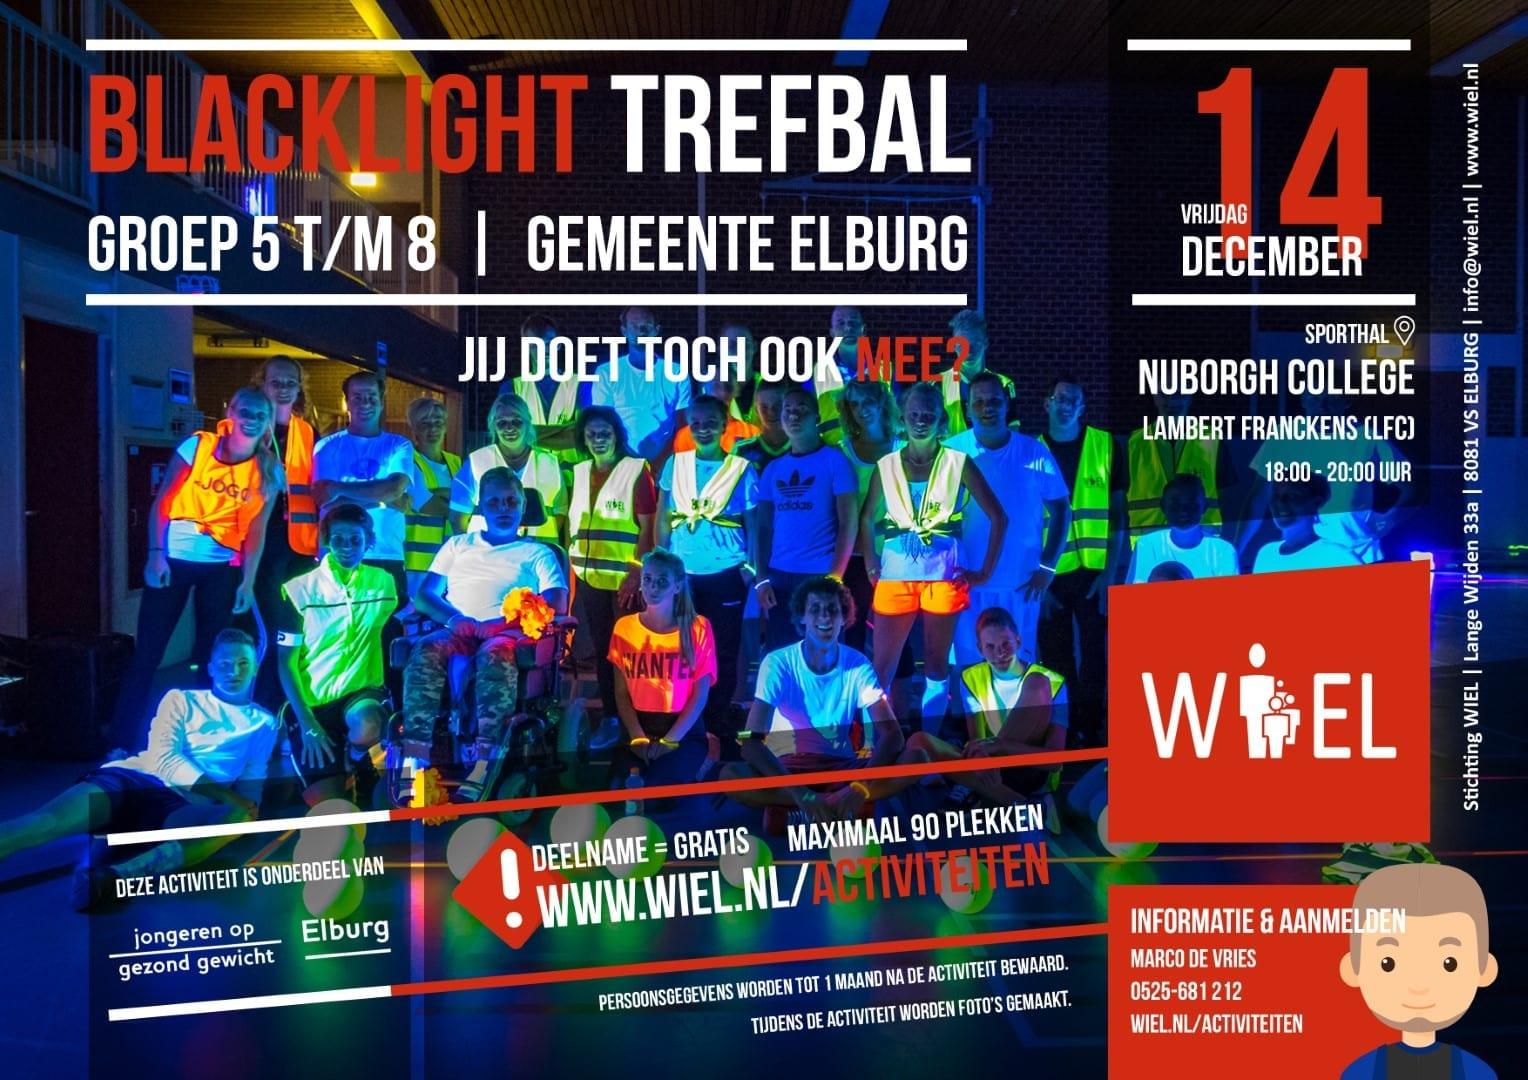 Blacklight Trefbal - Stichting WIEL